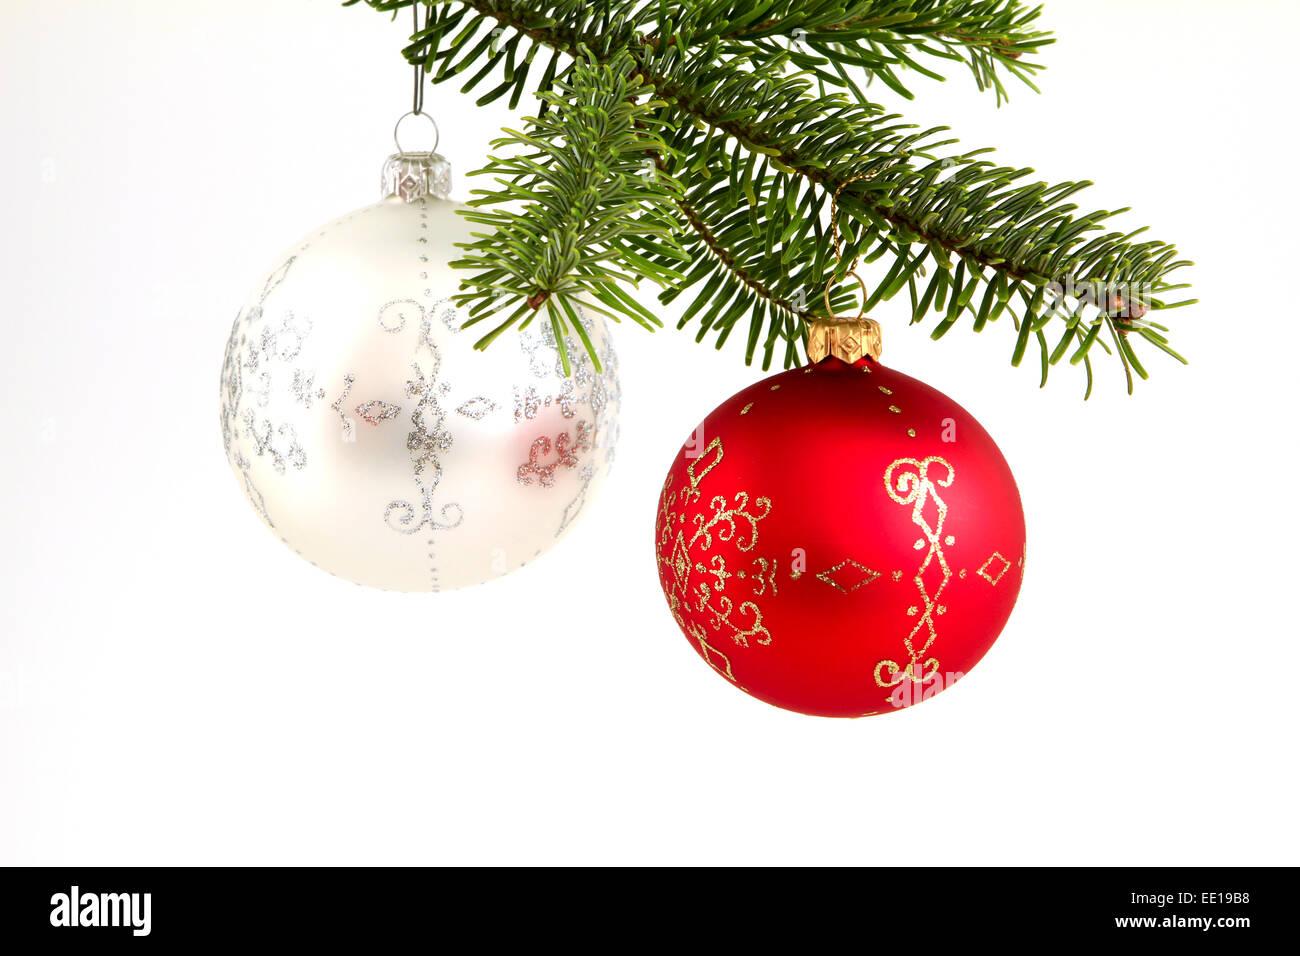 Christbaumkugeln Hellgrün.Weihnachtsschmuck Christbaumkugeln Stock Photo 77475980 Alamy